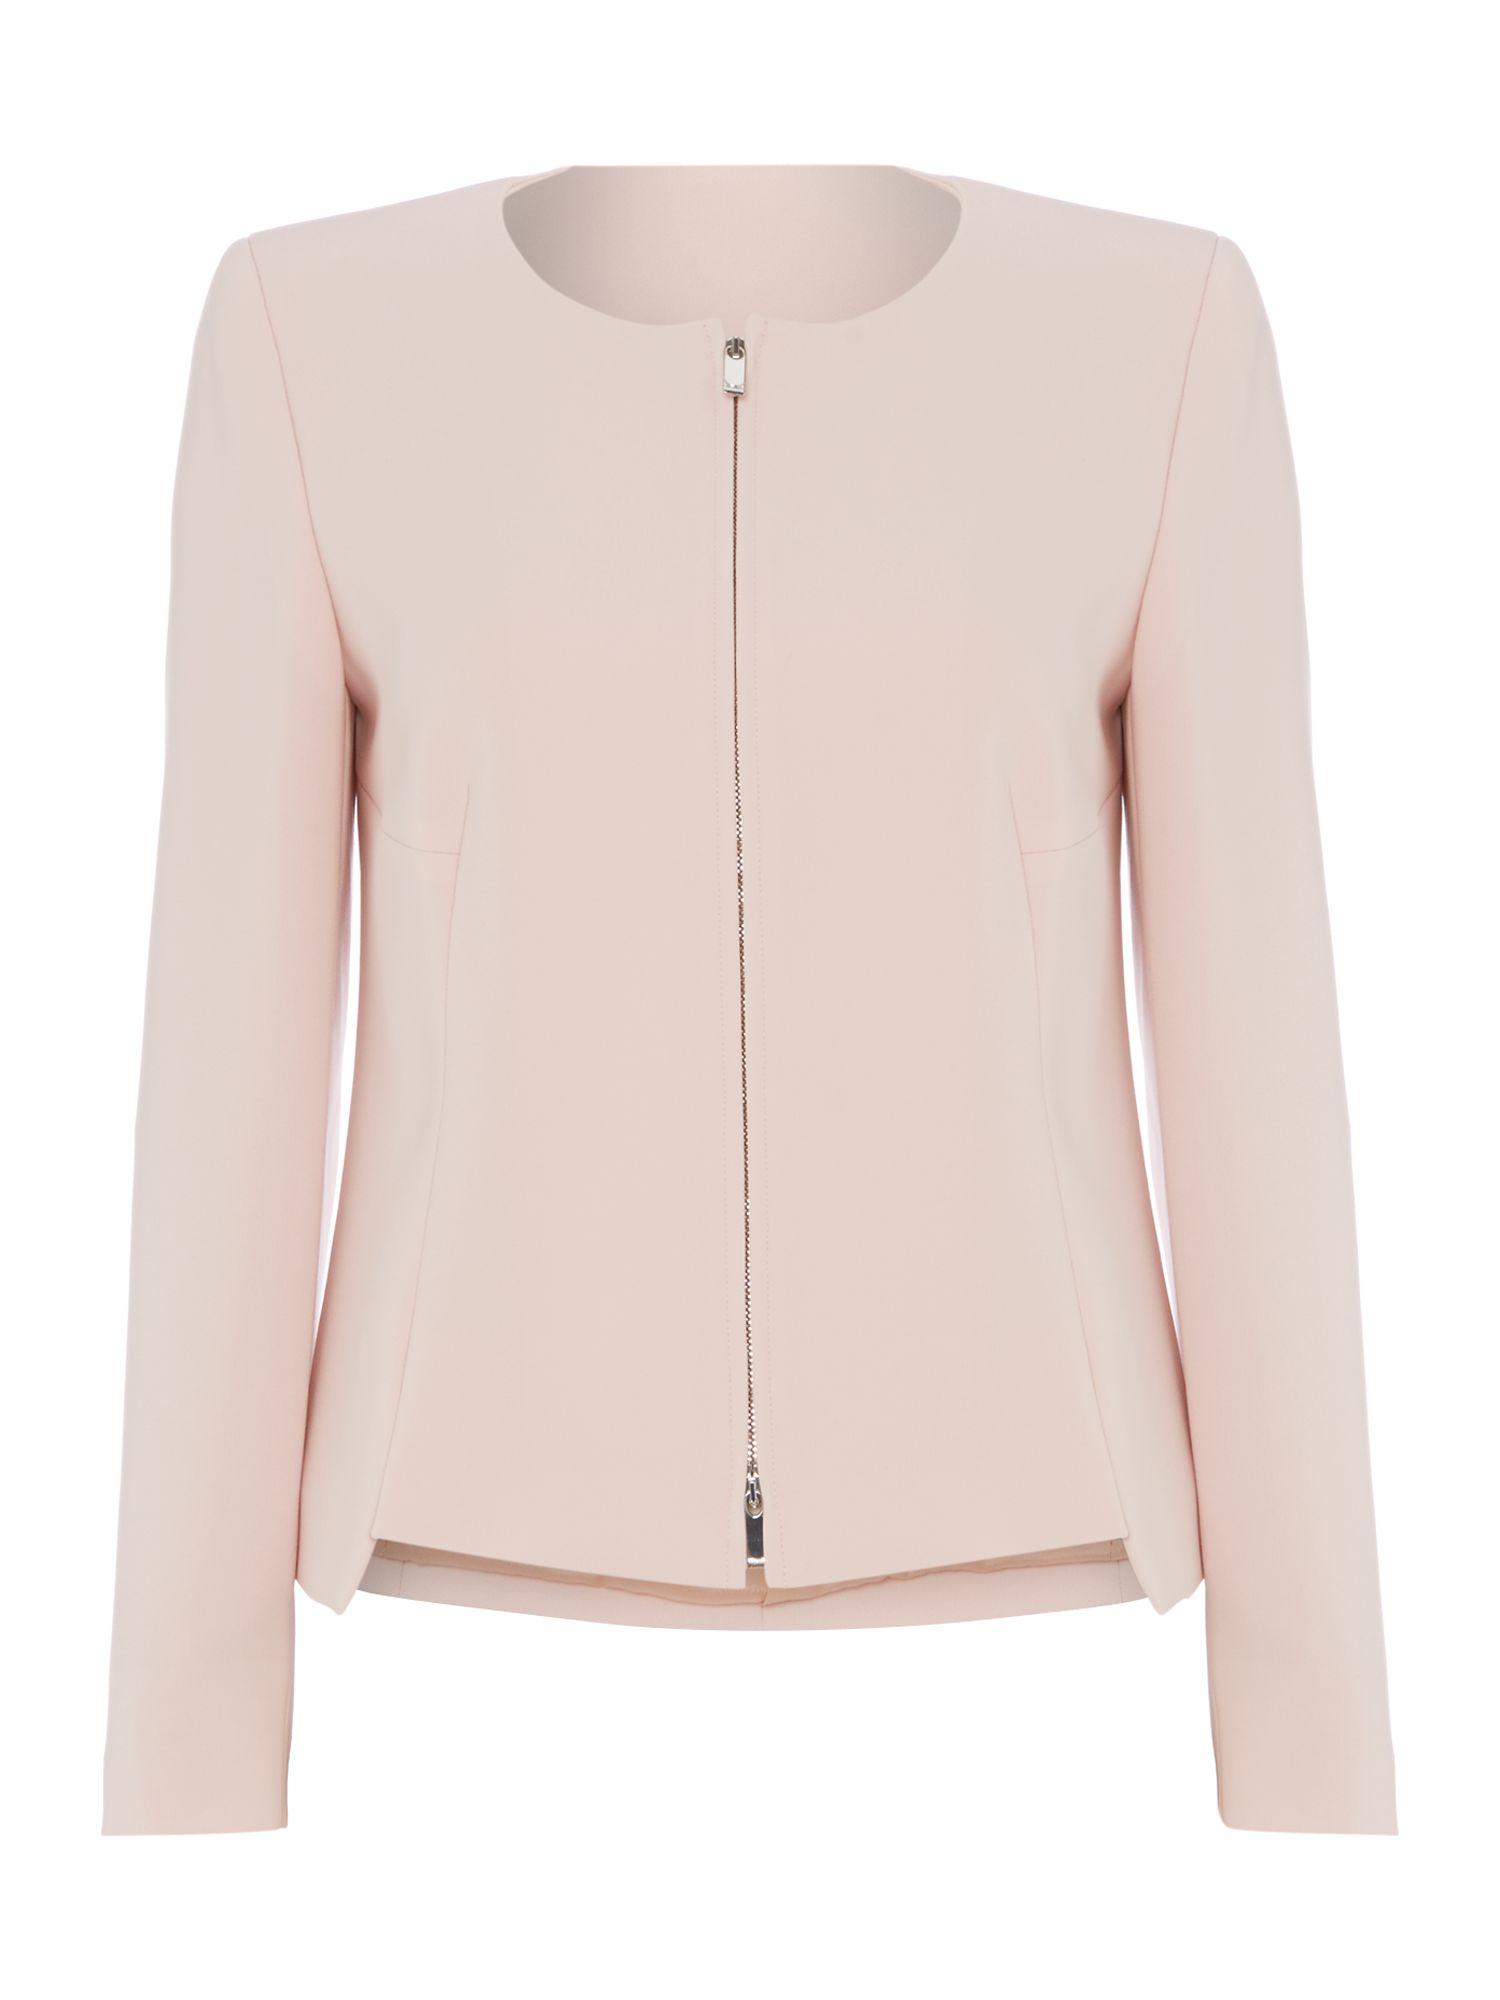 Max mara Pec Smart Collarless Jacket in Pink | Lyst